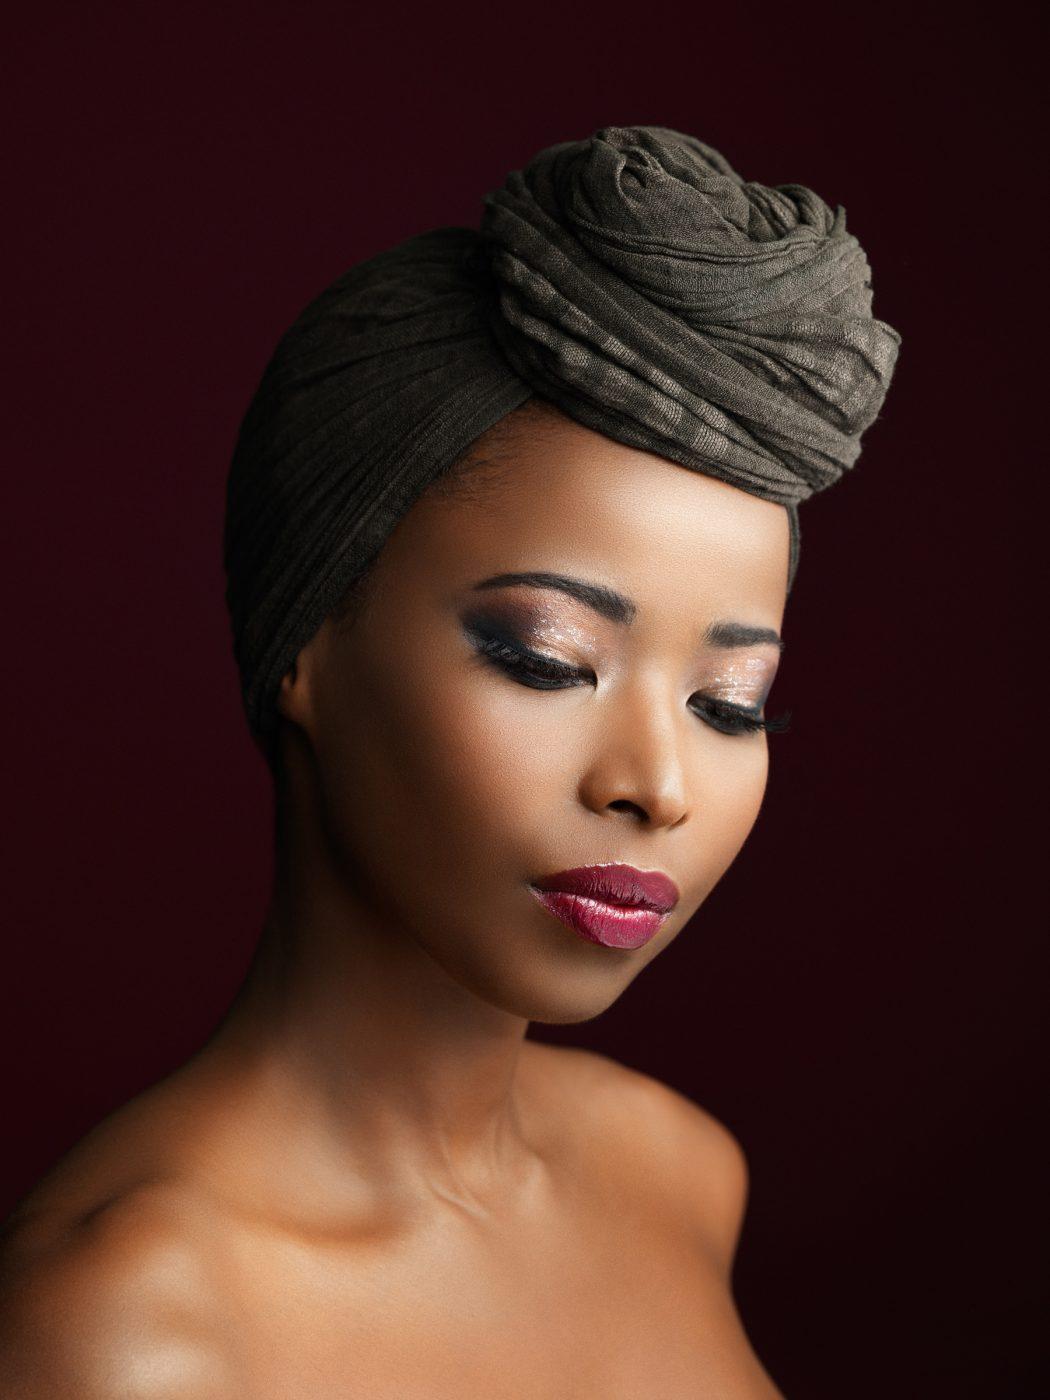 dark skin makeup, montreal makeup artist, bridal makeup montreal, Montreal bride makeup, creative makeup montreal, ontario makeup artist